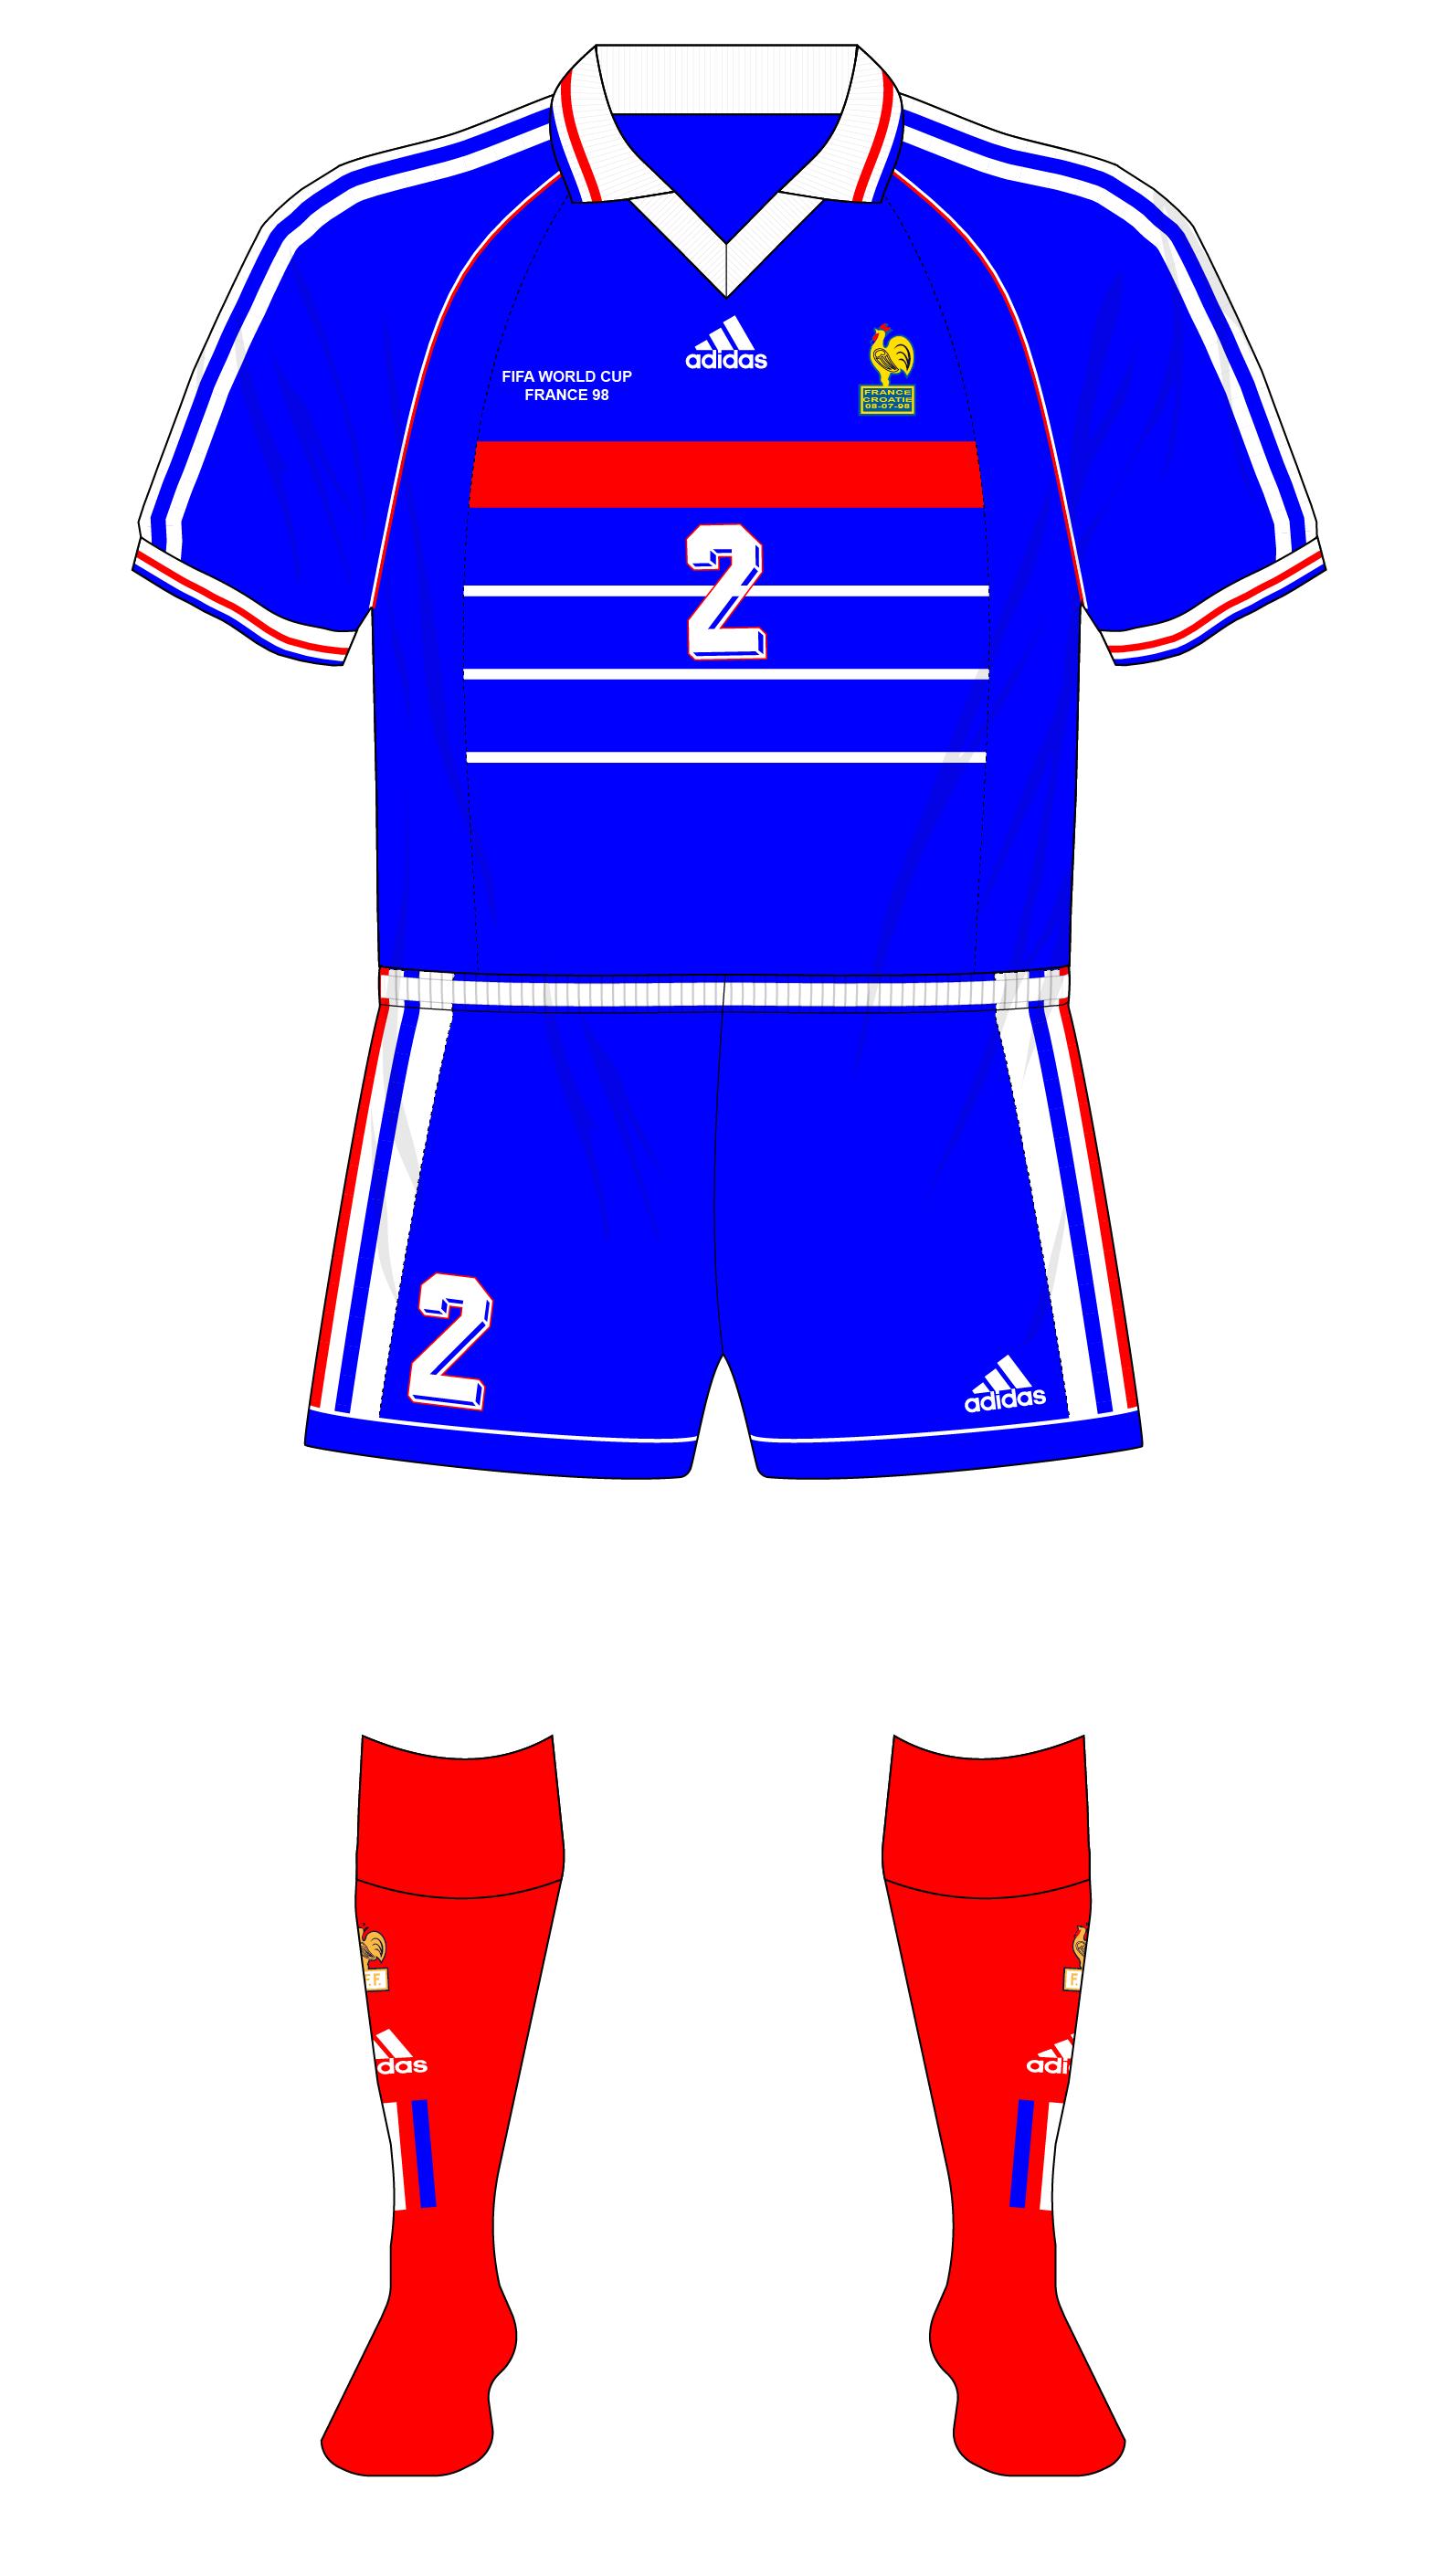 free shipping 925f1 4f439 France-1998-adidas-home-kit-blue-shorts-Croatia-01 | RB Jerseys